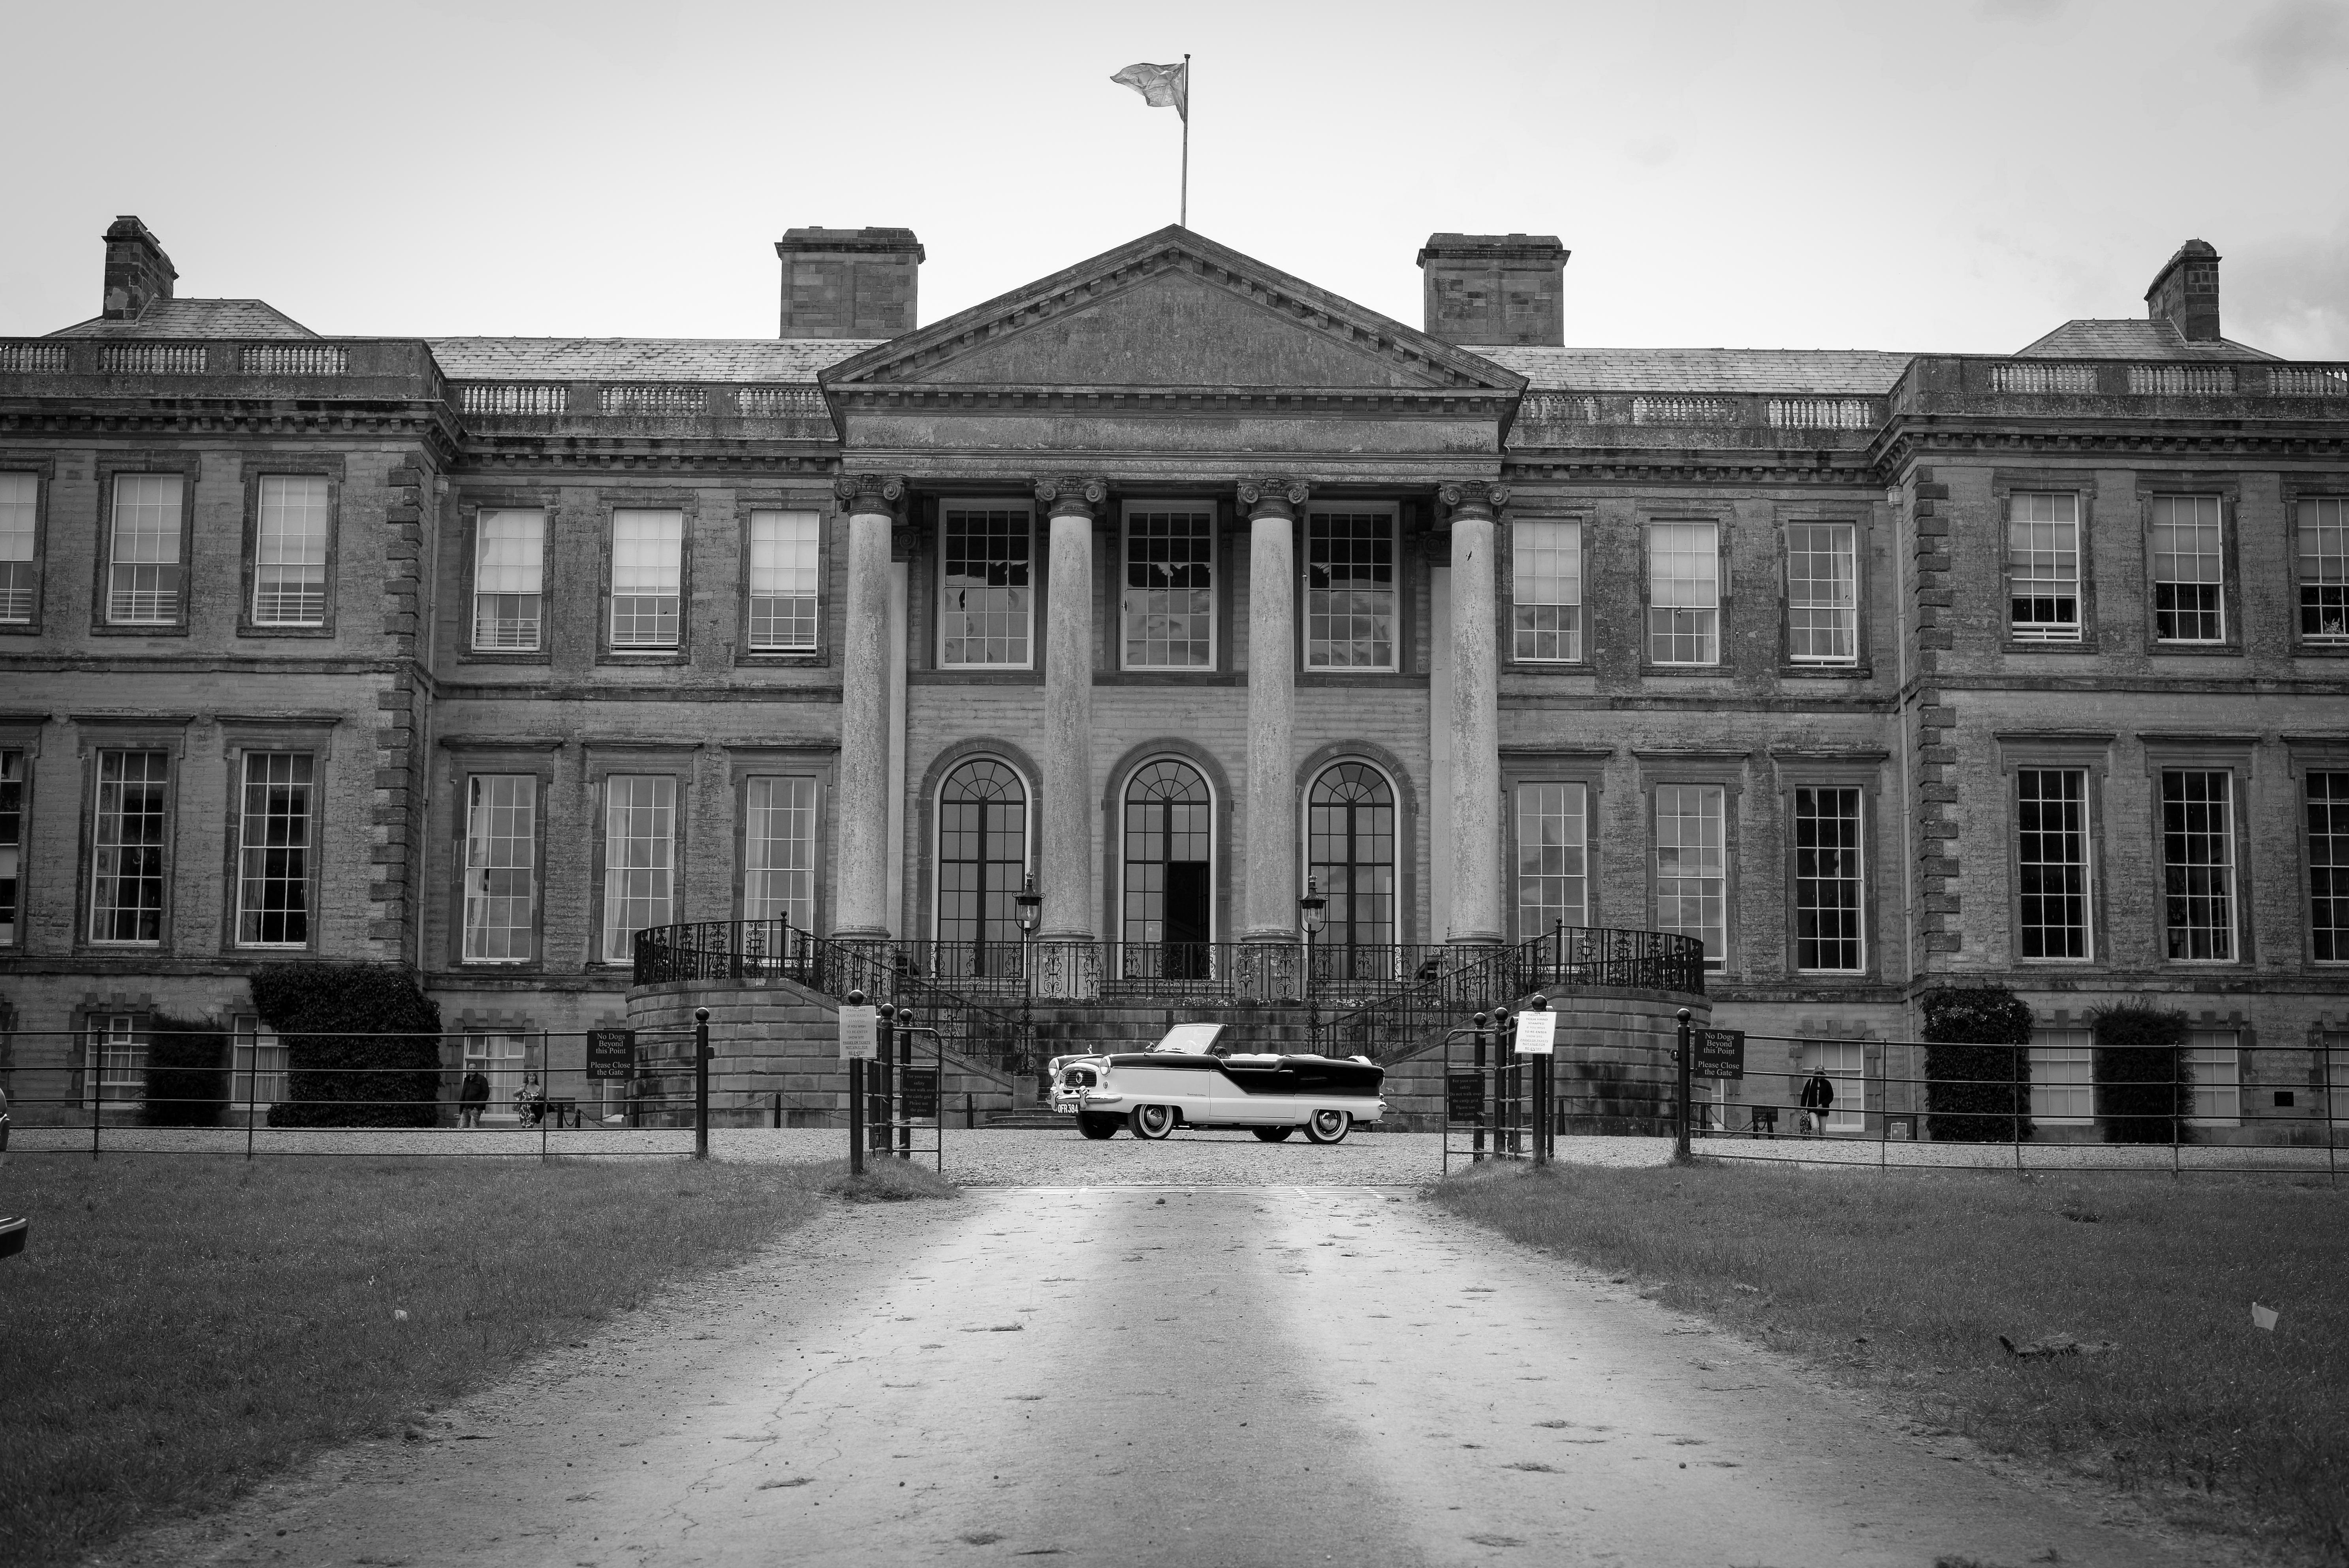 Ragley Hall (41)